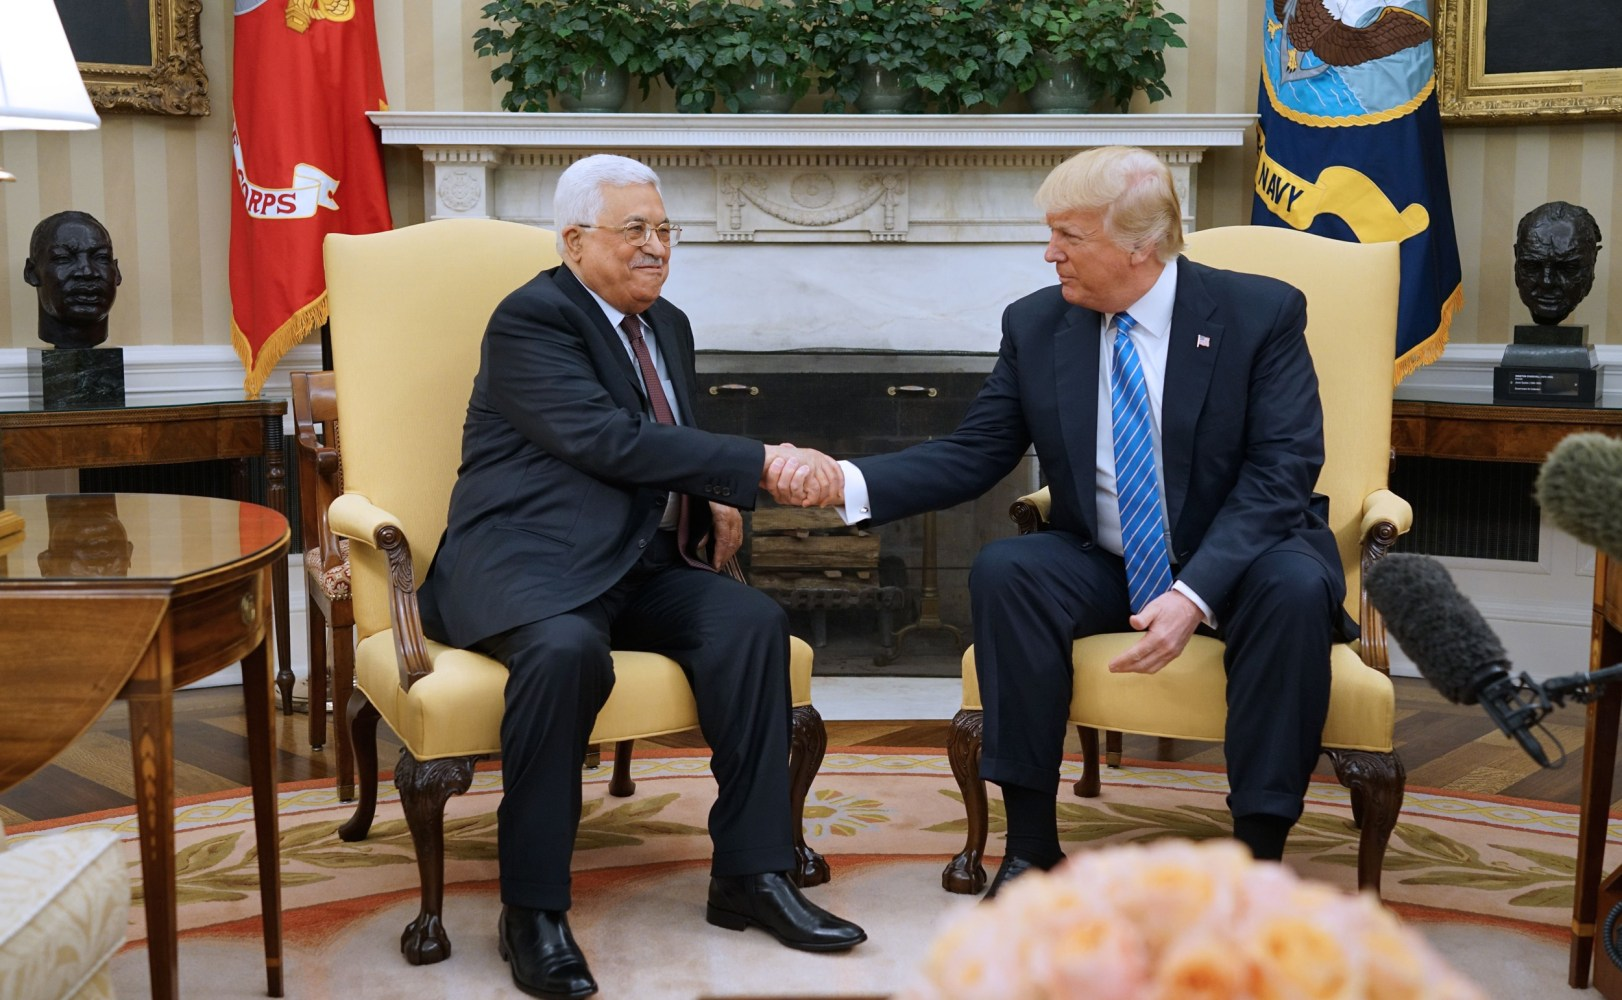 Trump and Abbas